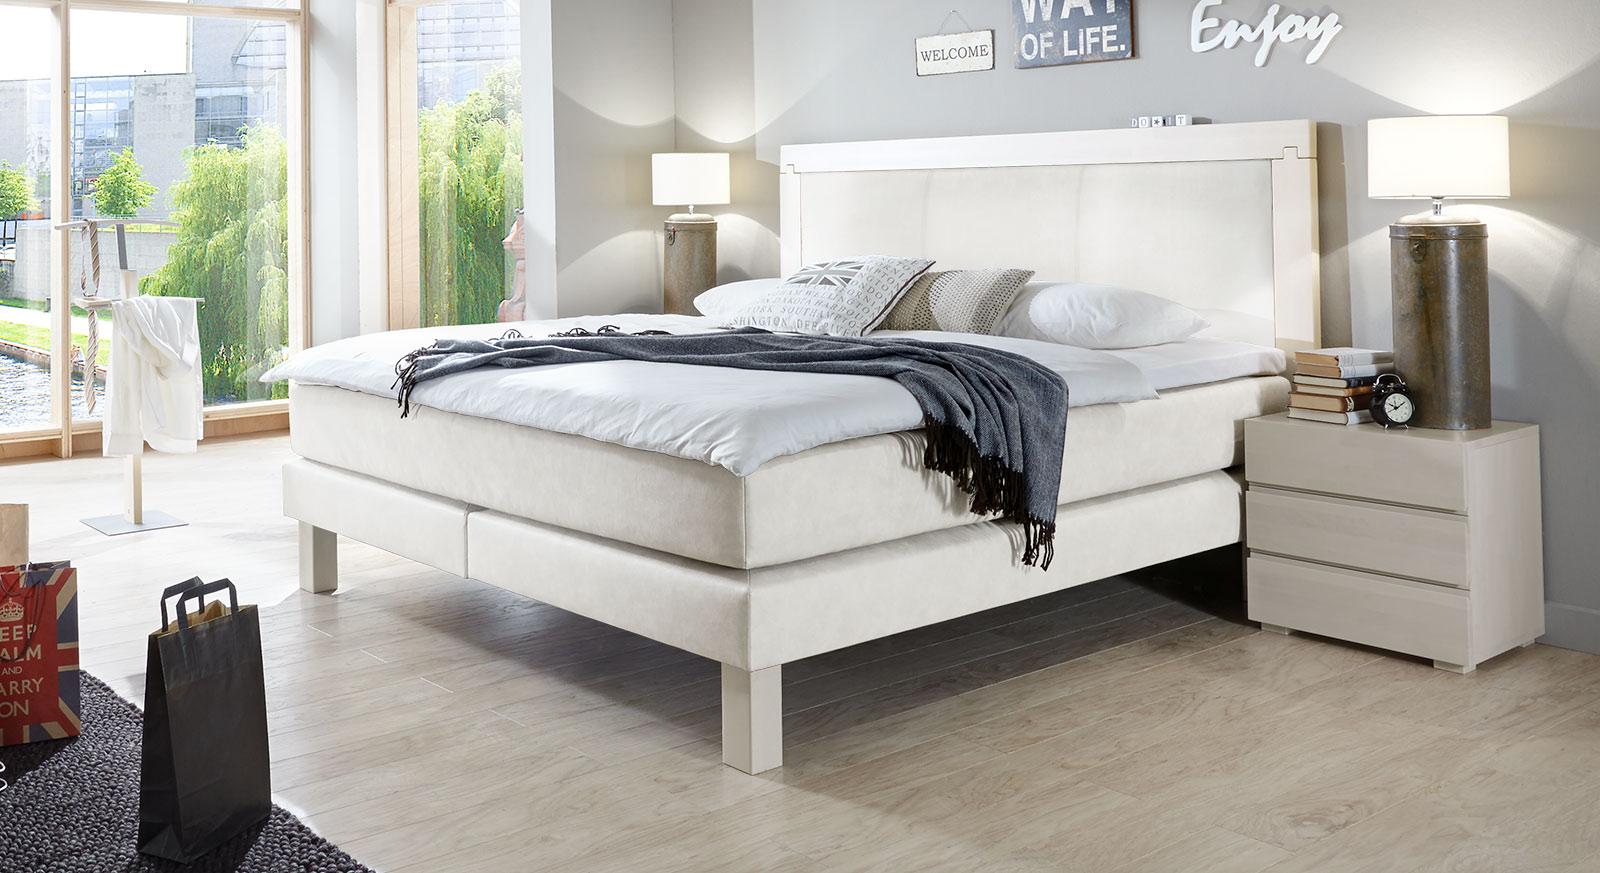 boxspring bett holzrahmen. Black Bedroom Furniture Sets. Home Design Ideas